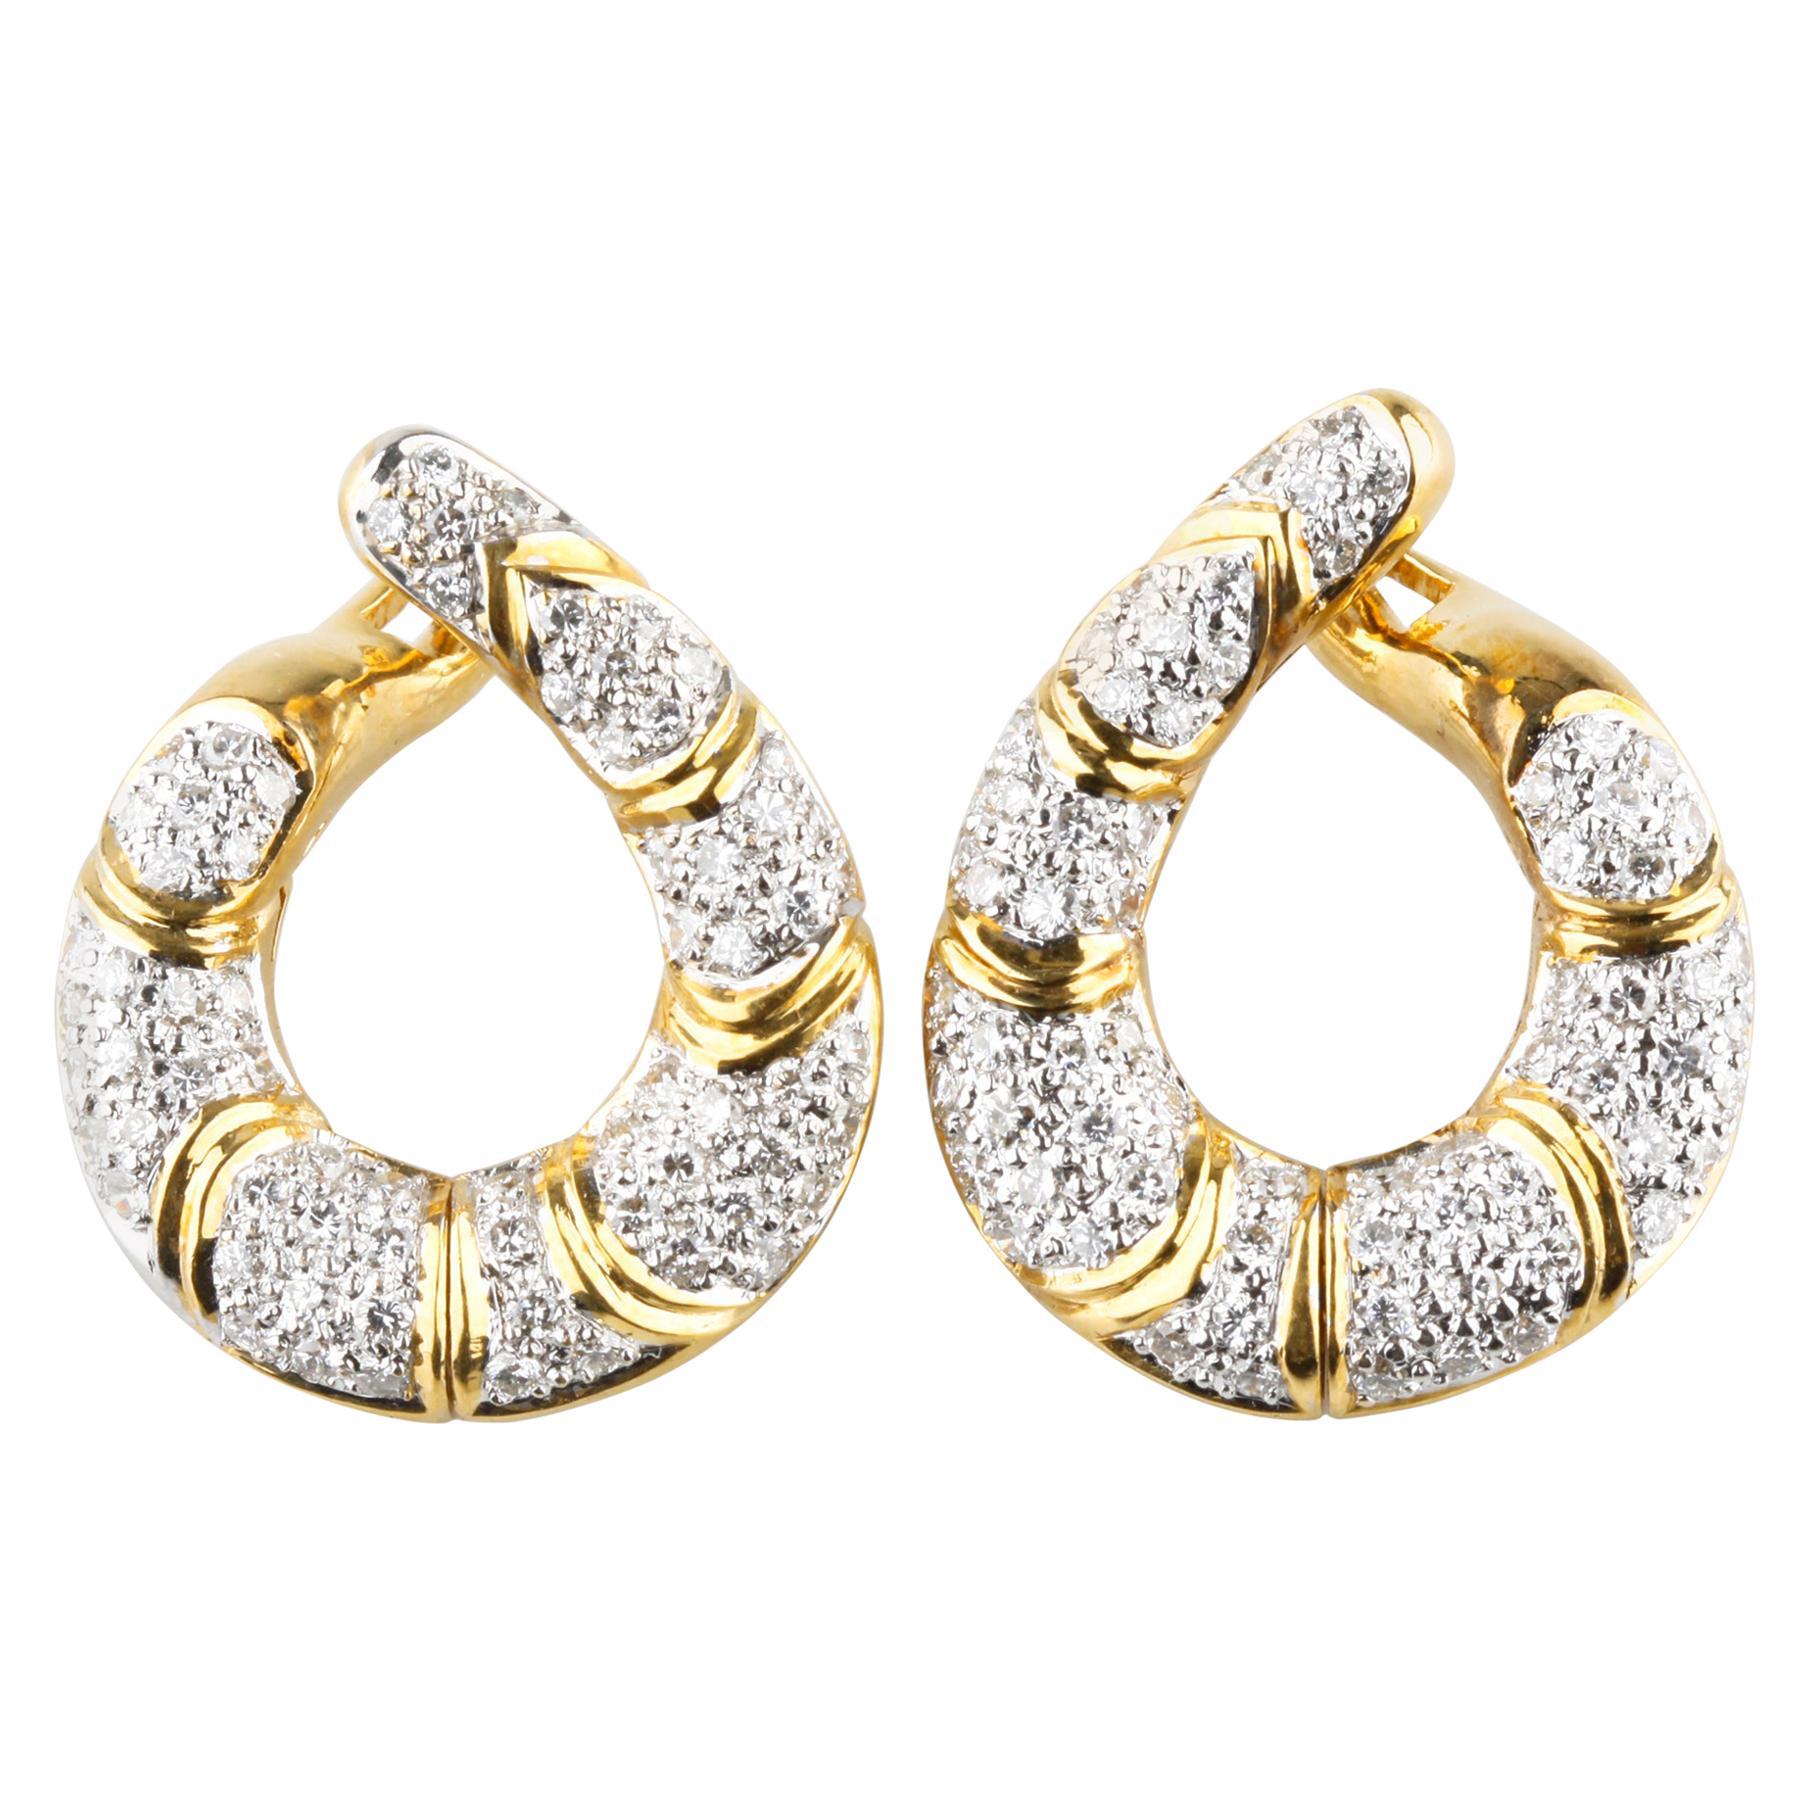 2 Carat Diamond Swoop Hinged Dangling Earrings in Two-Tone Gold